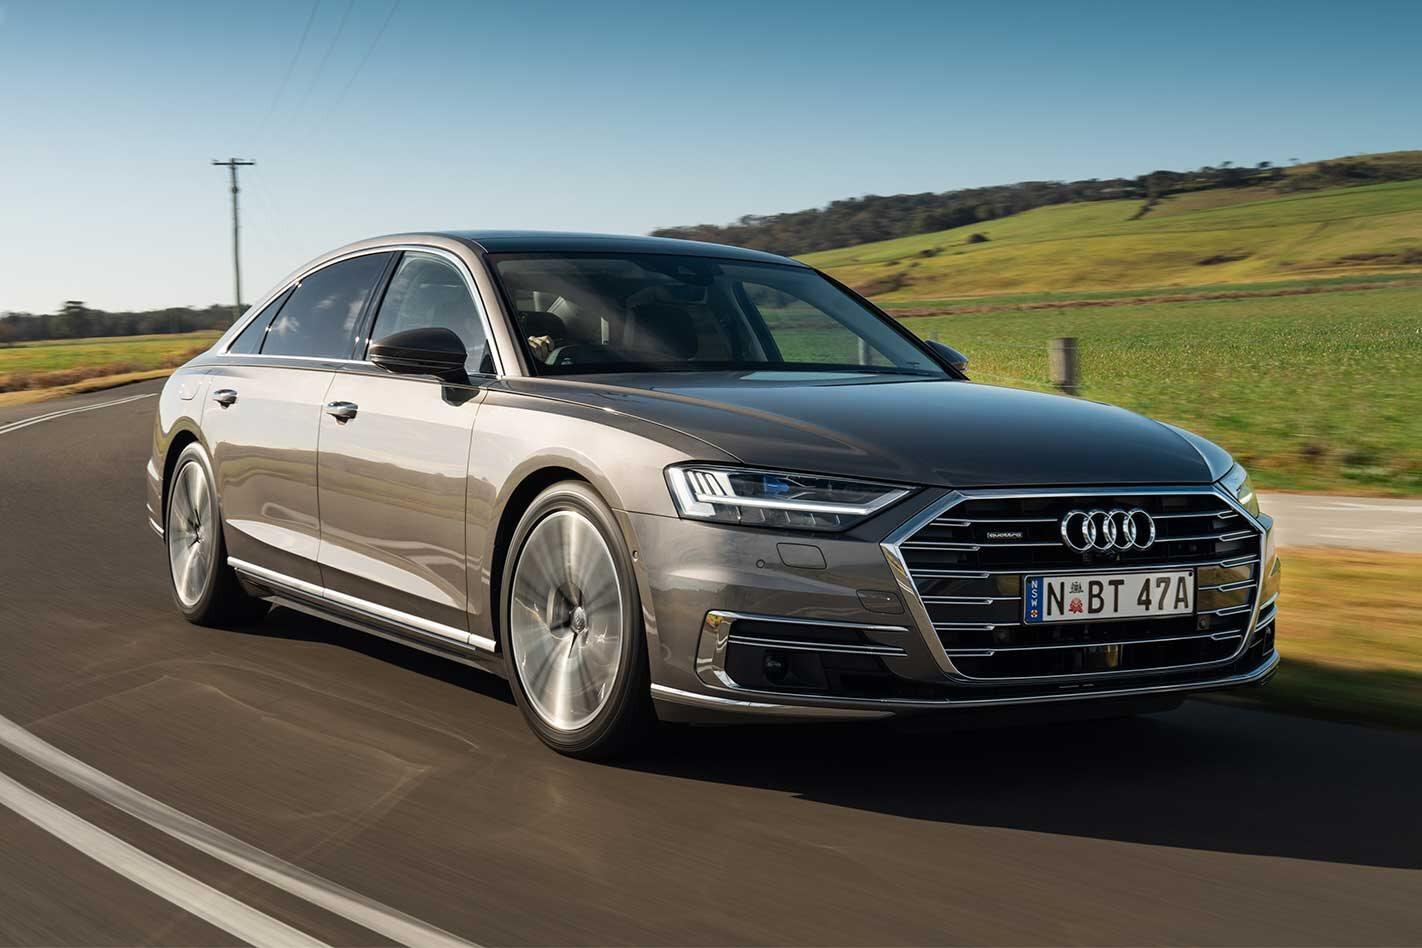 2019 Audi A8 55 TFSI performance review